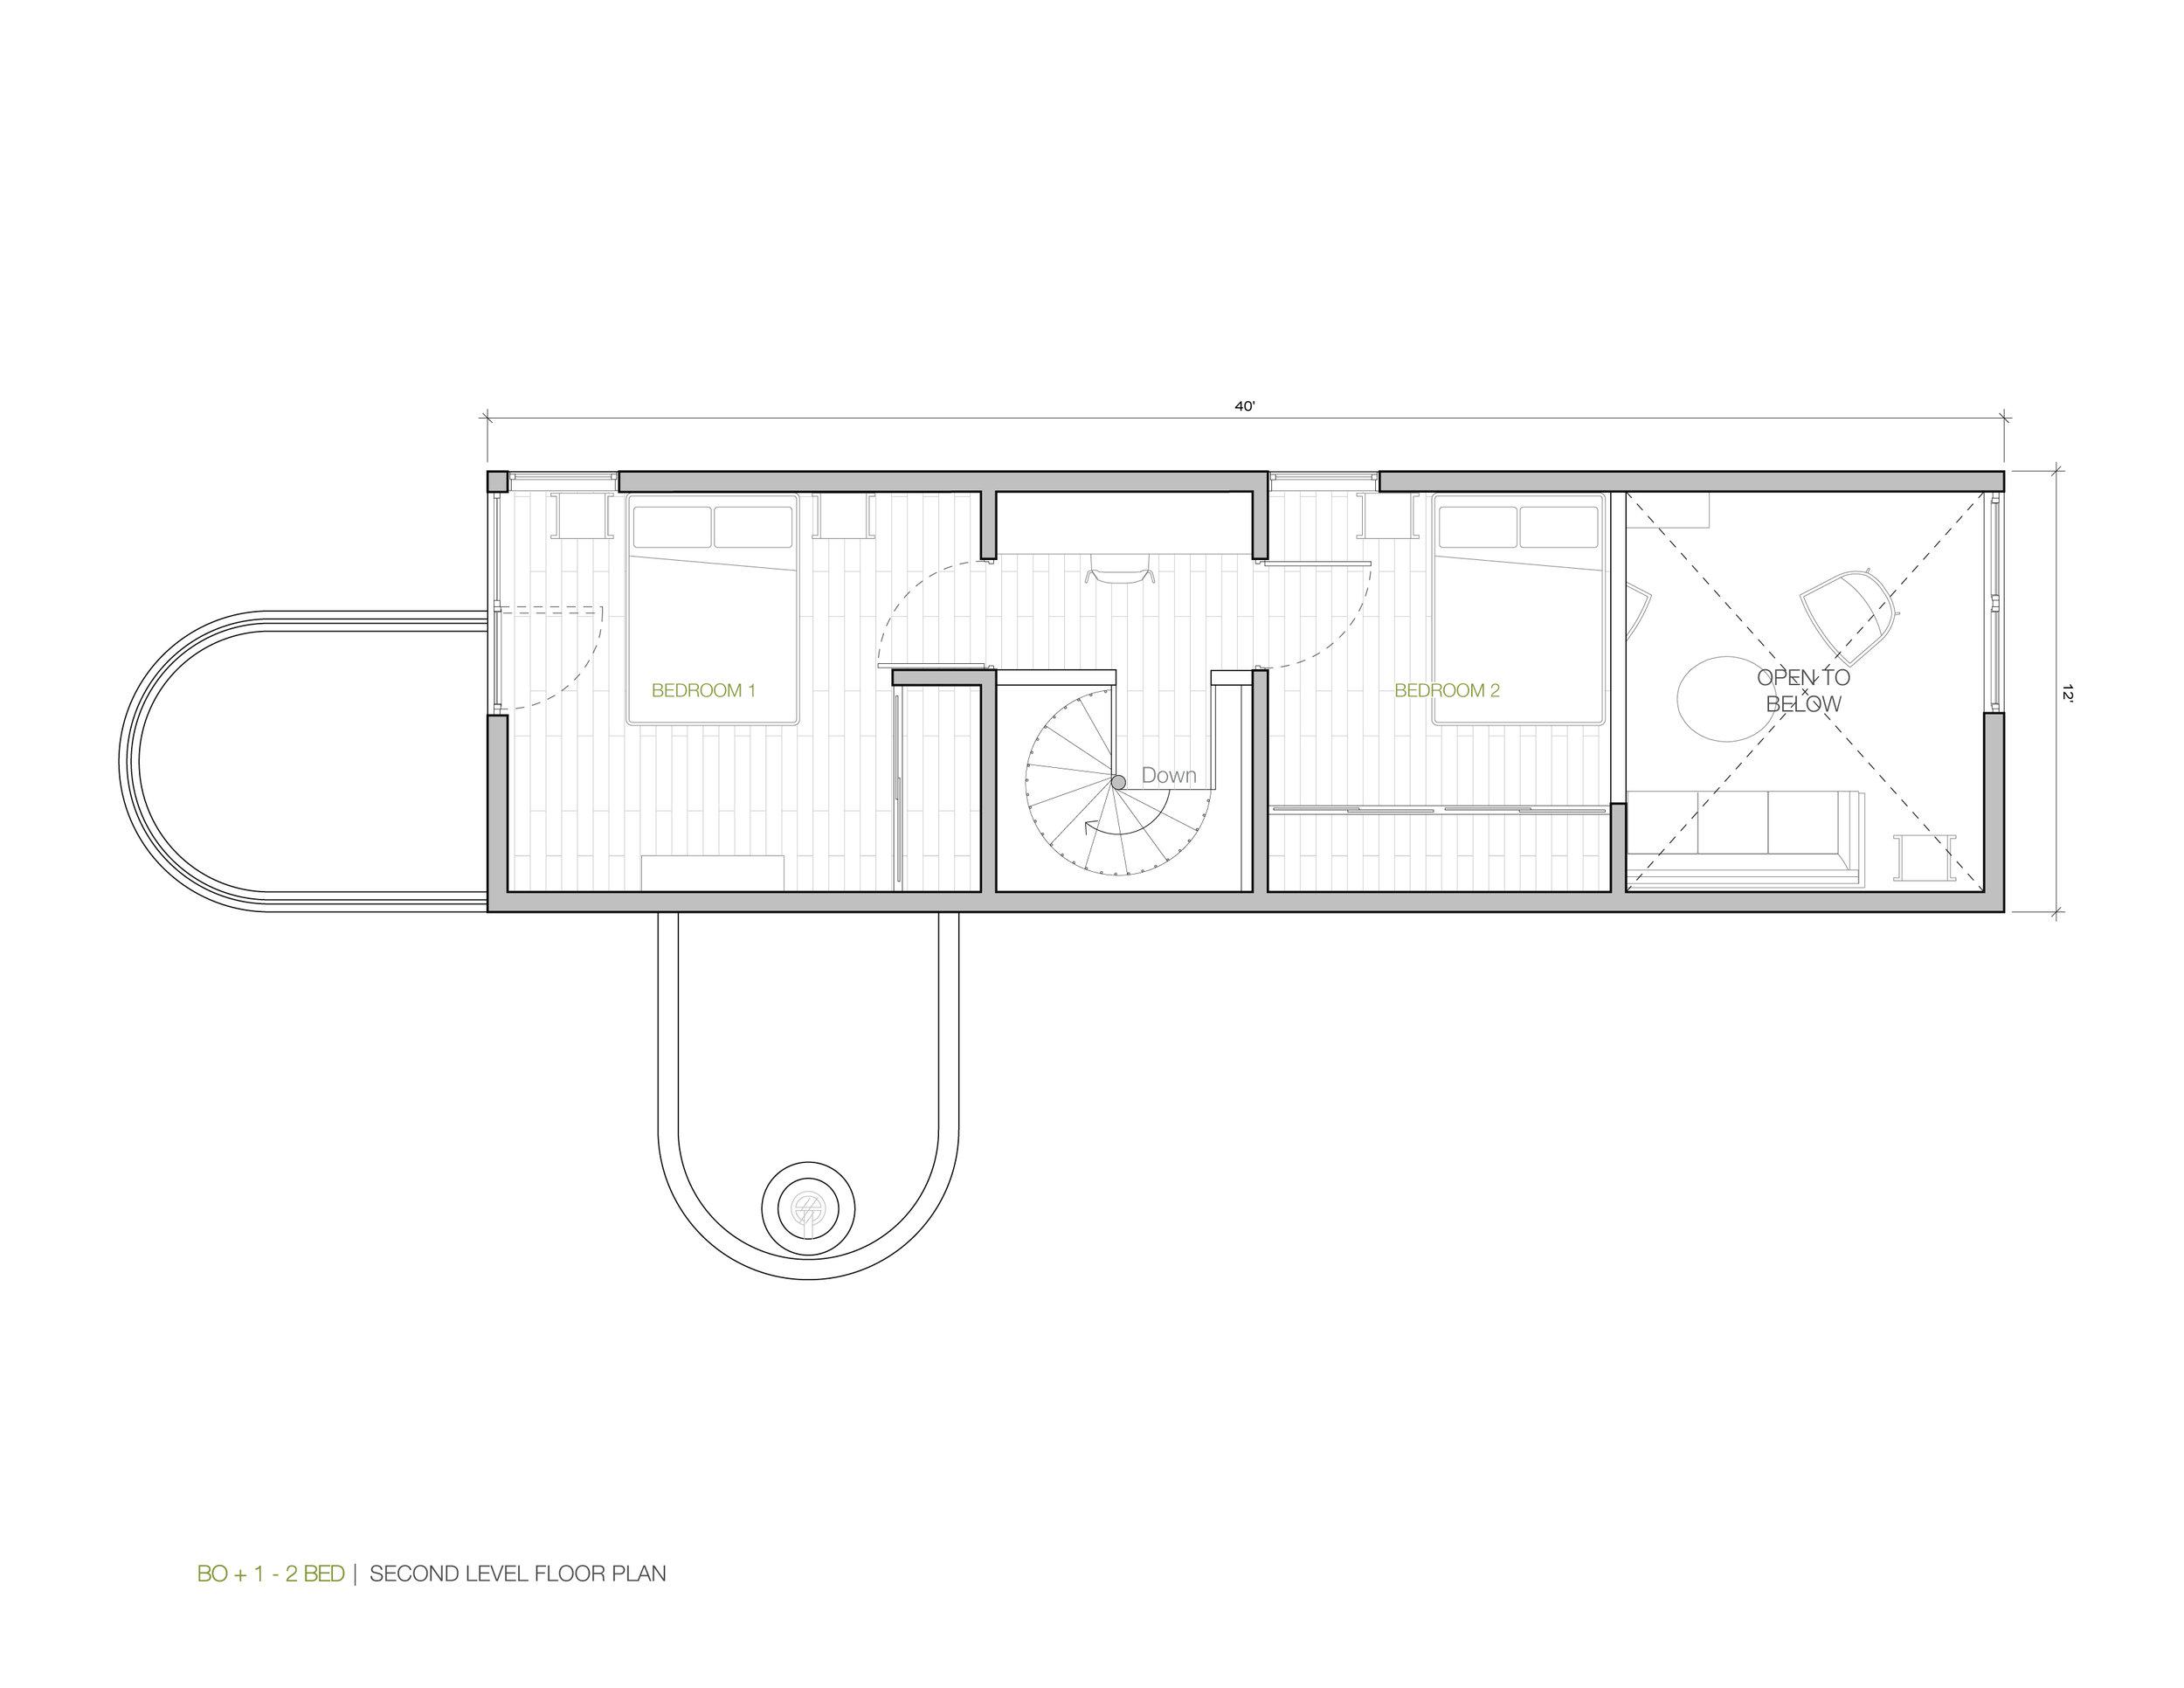 BO Floor plan-03.jpg